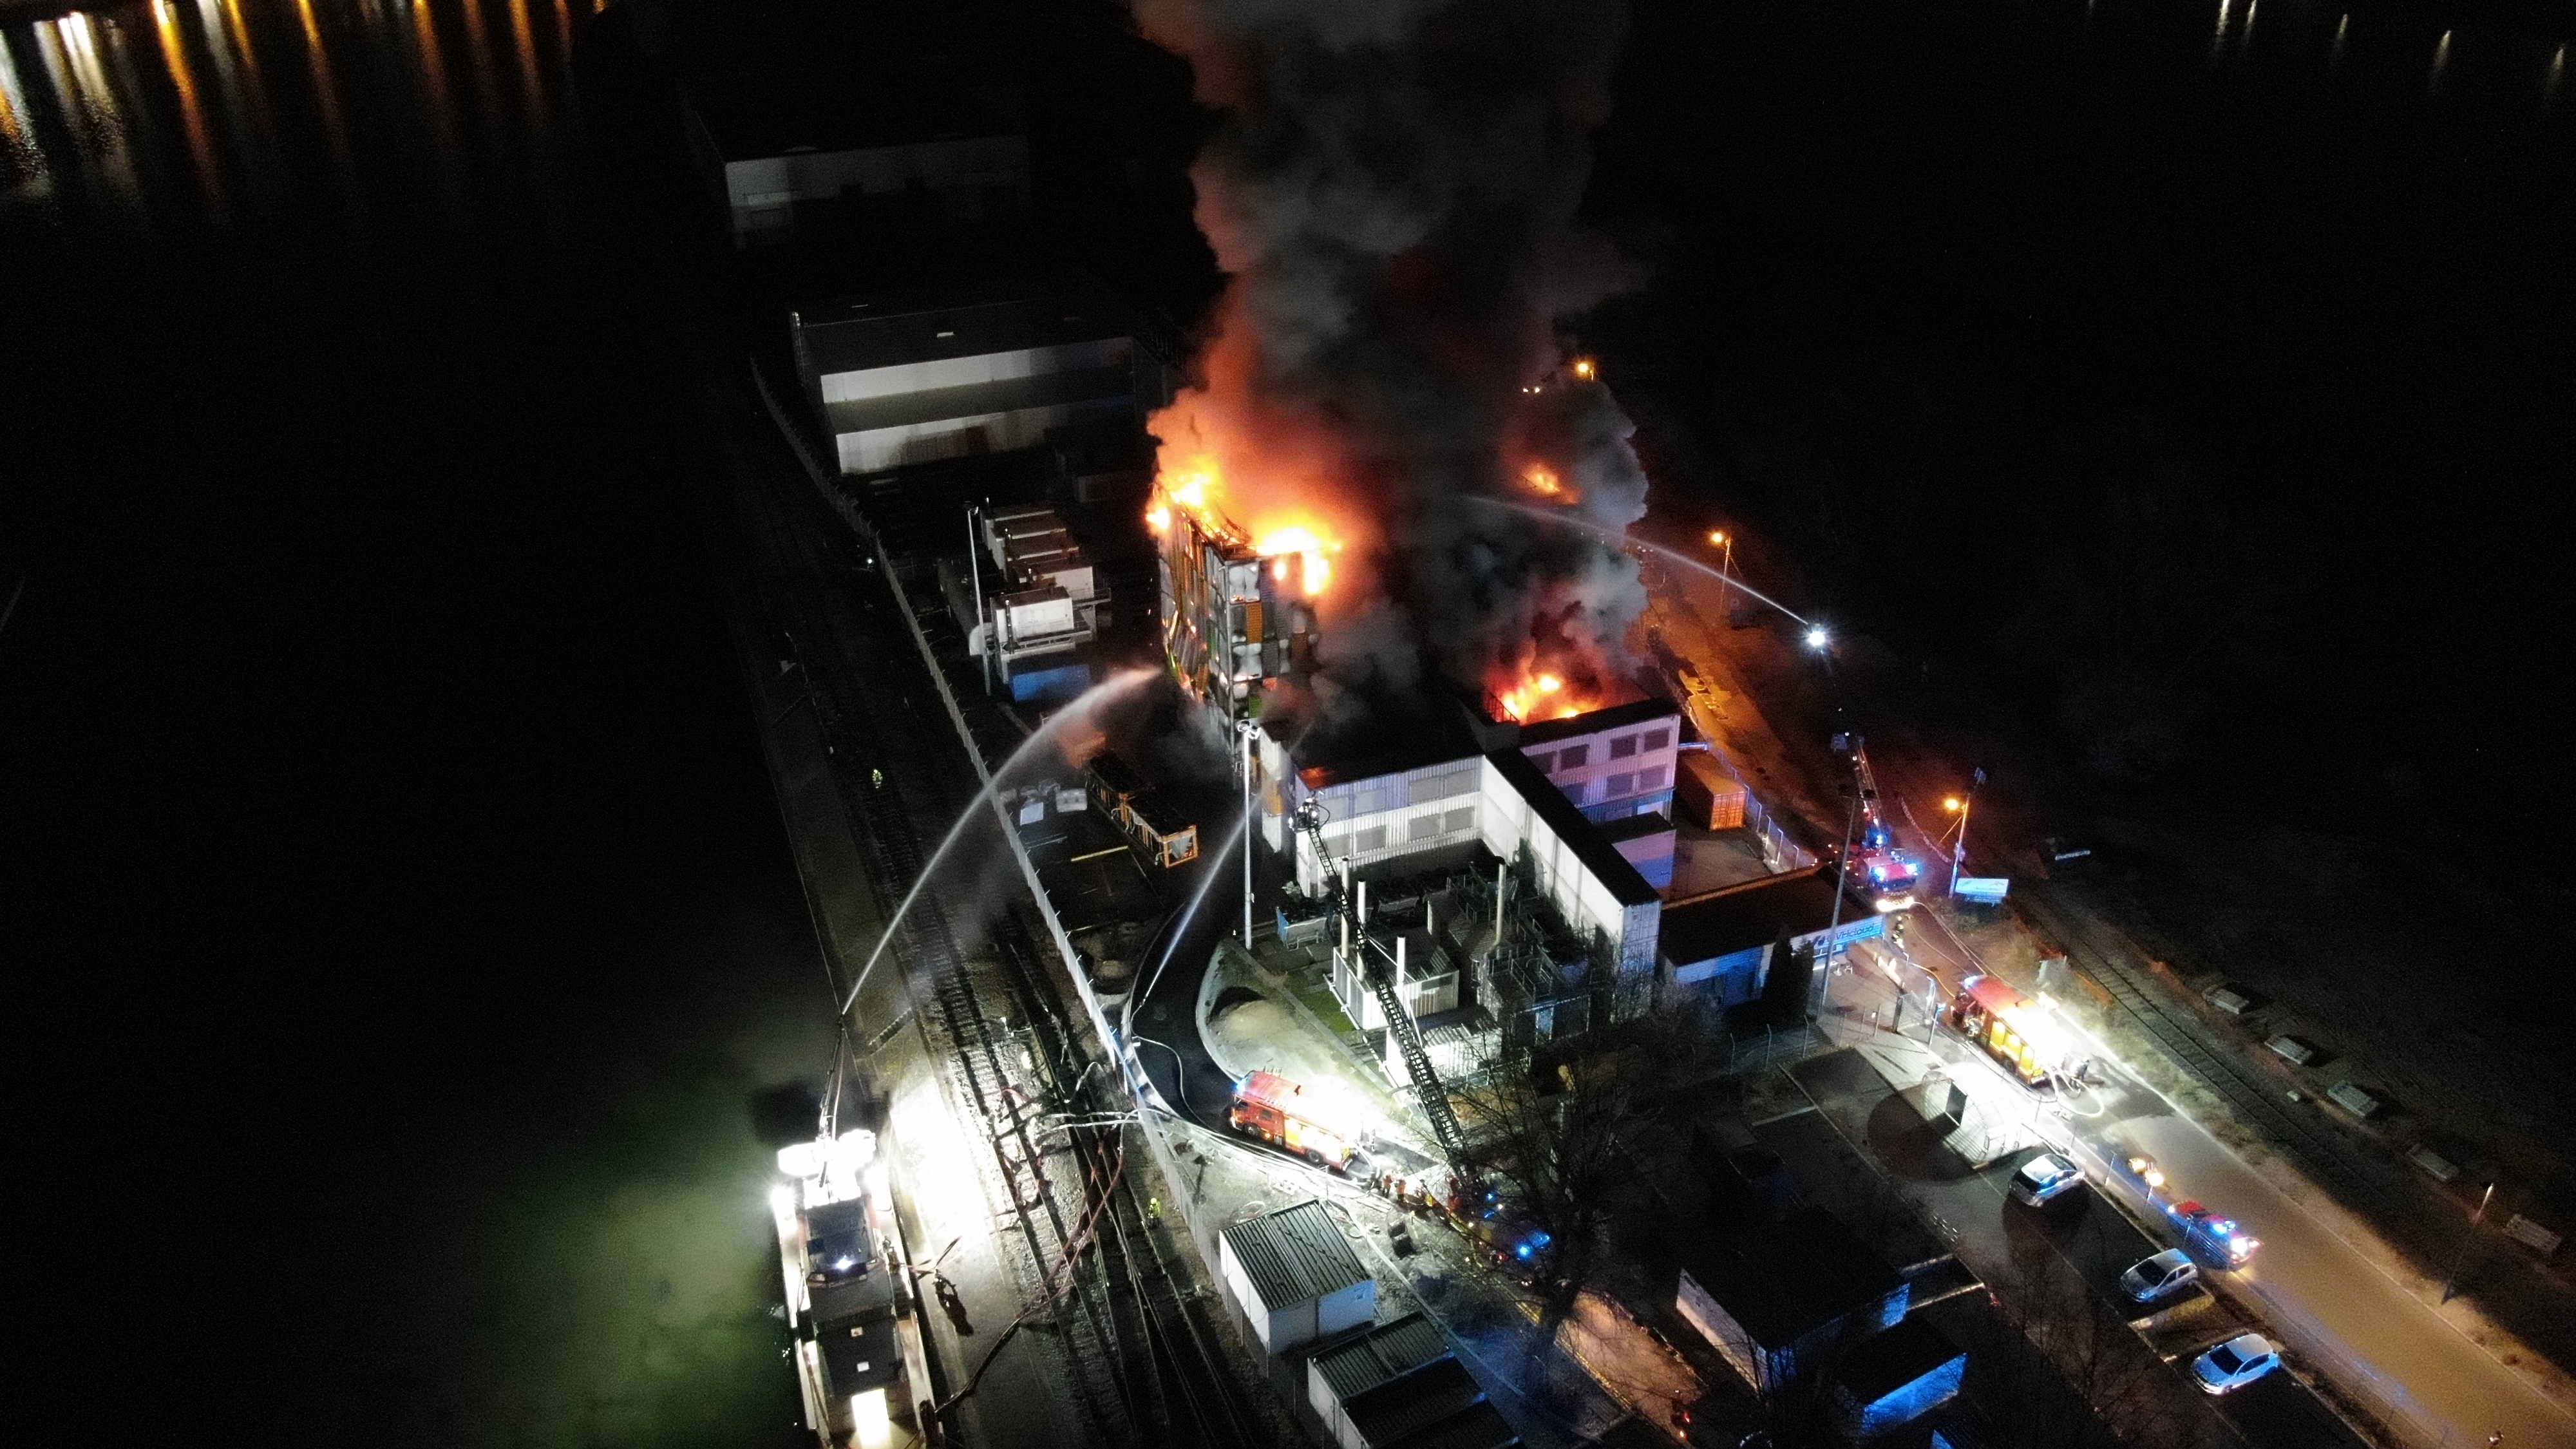 Fire Destroys the European Datacenter Containing 'Rust' Data